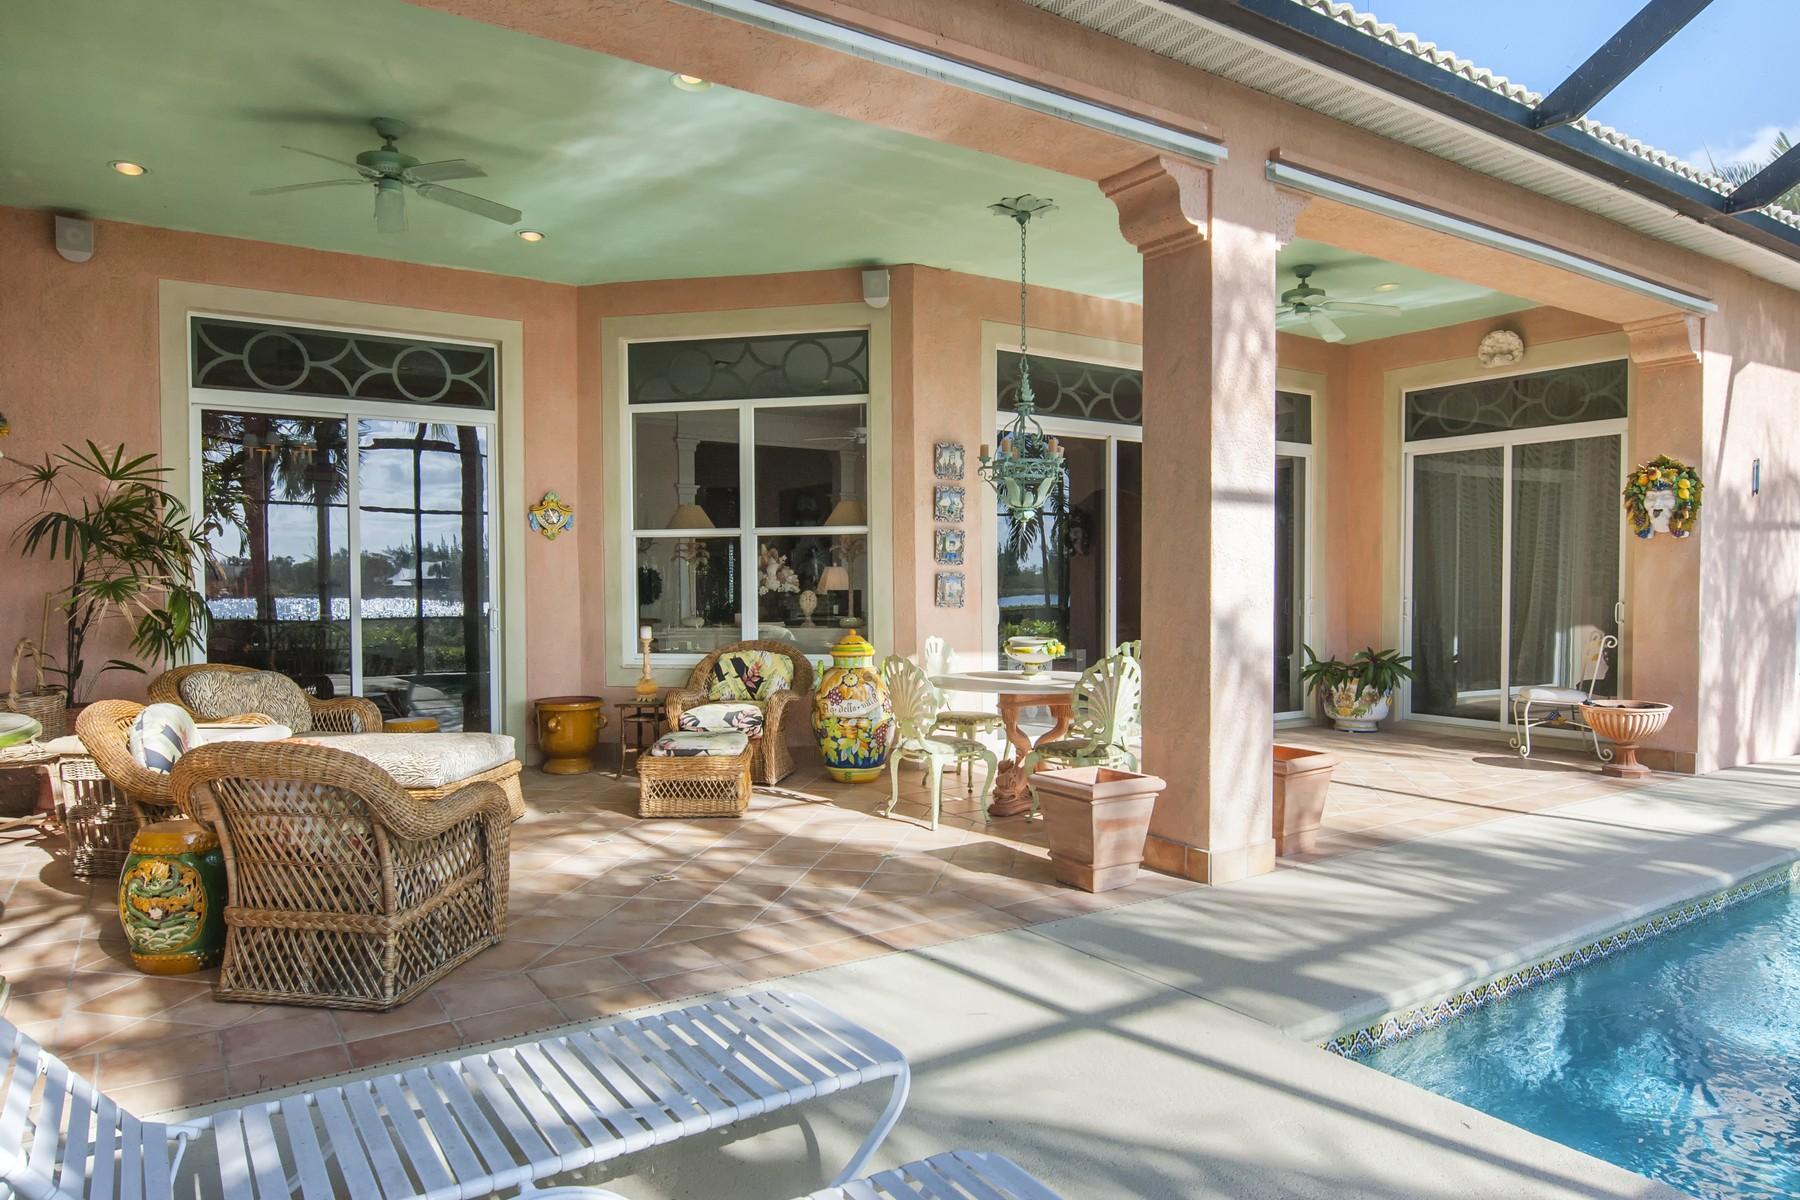 Additional photo for property listing at Island Club Riverside 1241 W Island Club Sq Vero Beach, Florida 32963 United States